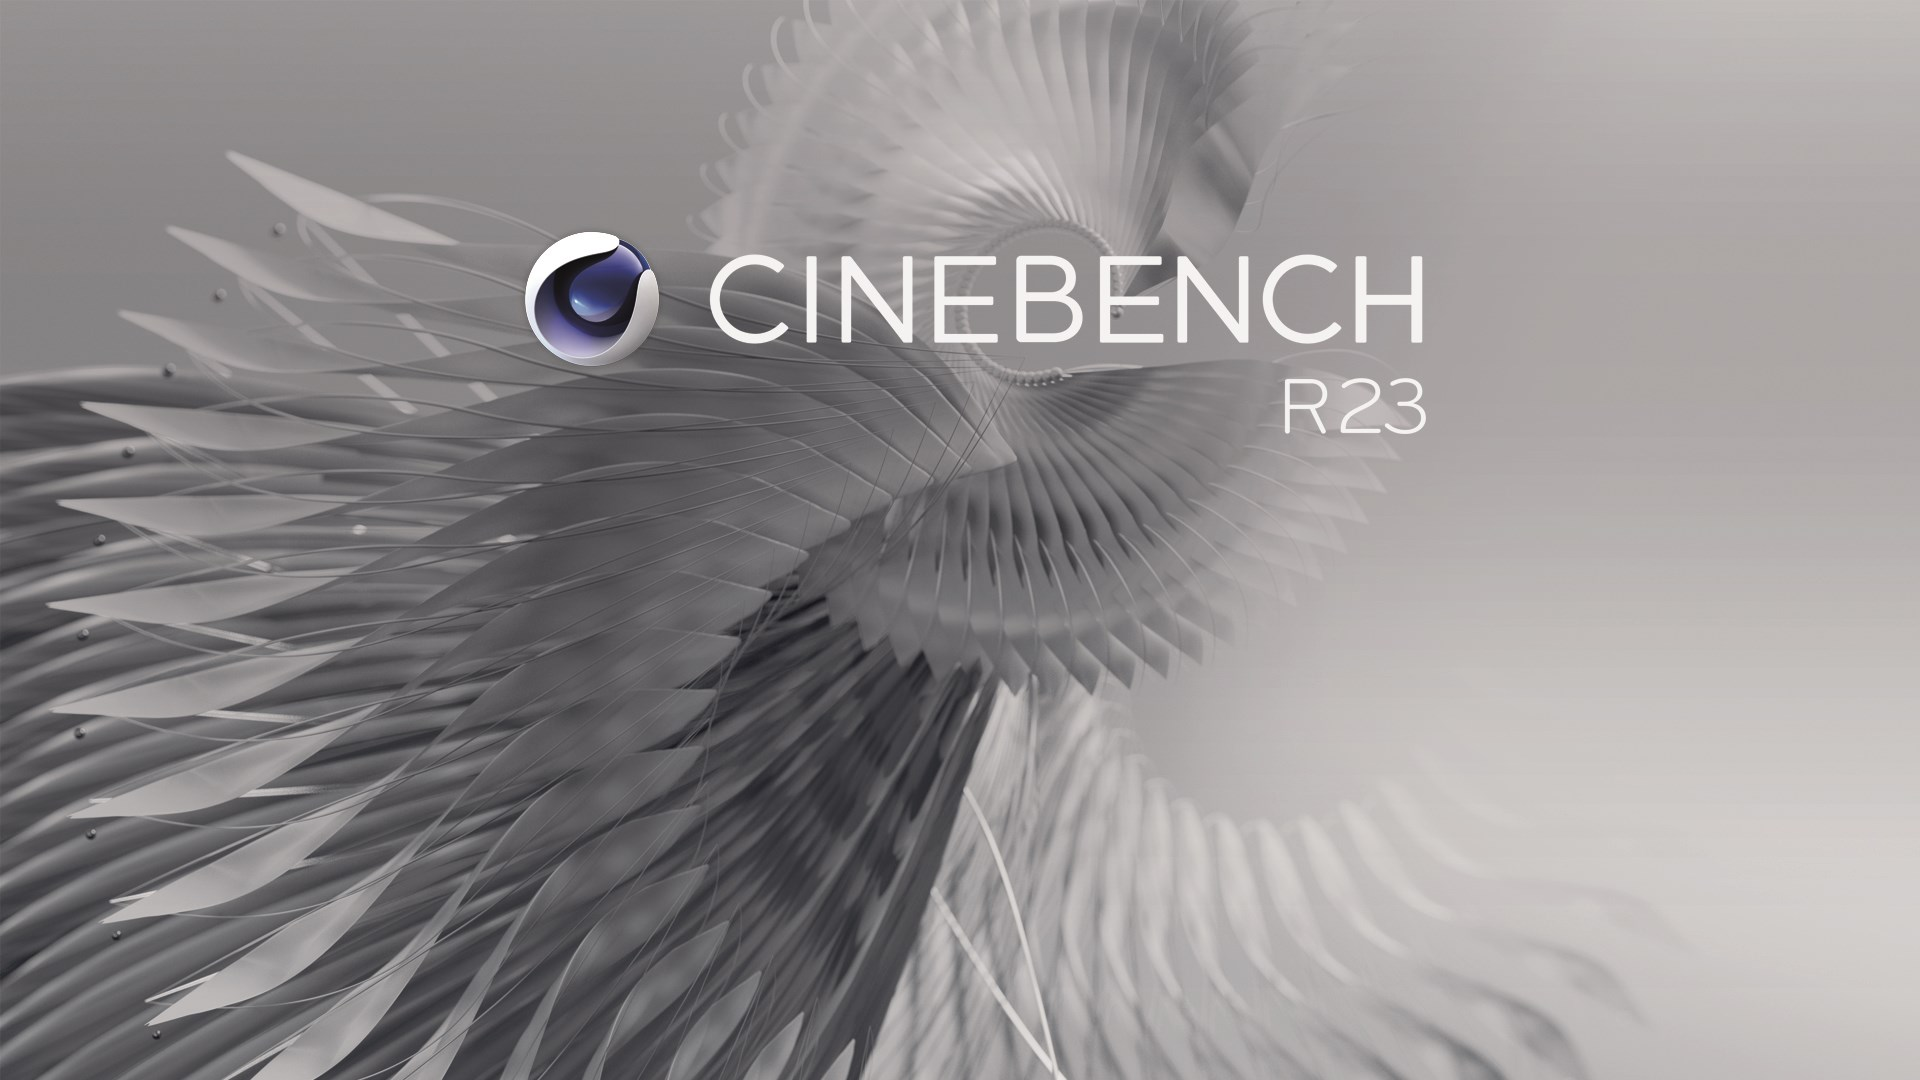 Cinebench R15 R20 R23 CPU and OpenGL test – Intel Xeon E5-1650 – GPU GeForce GTX 950